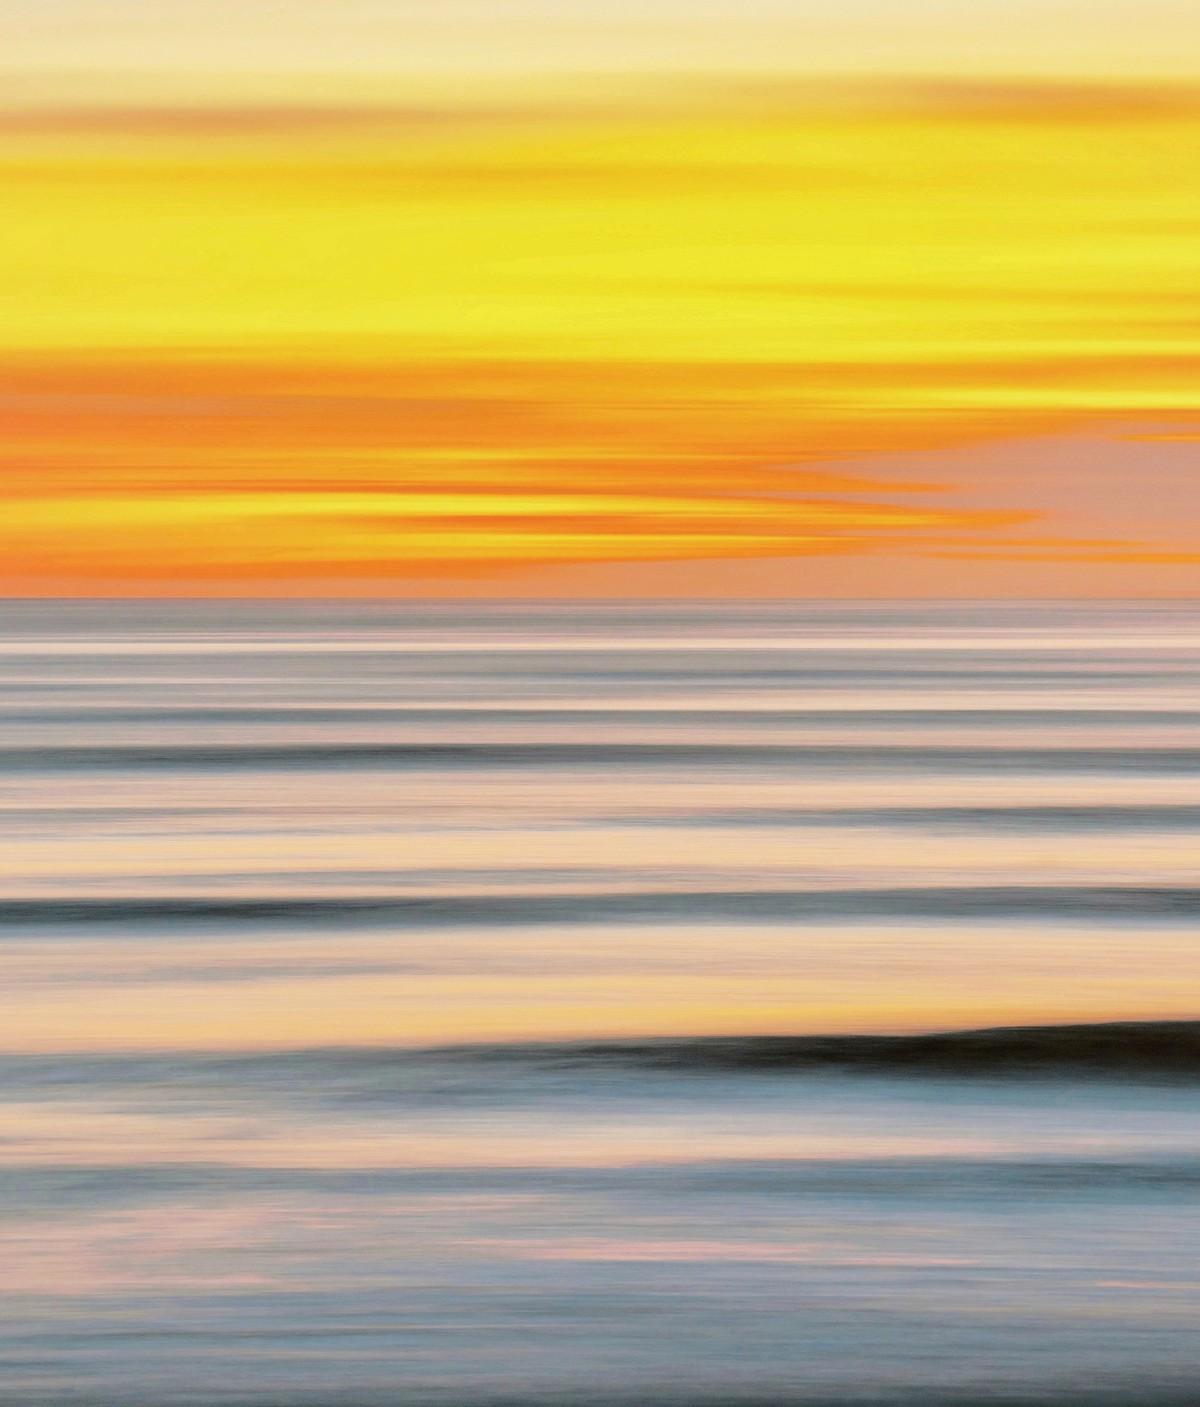 Seascape No. 4 by M. Shafiq, Digital Photography, Digital Print on Archival Paper, Orange color